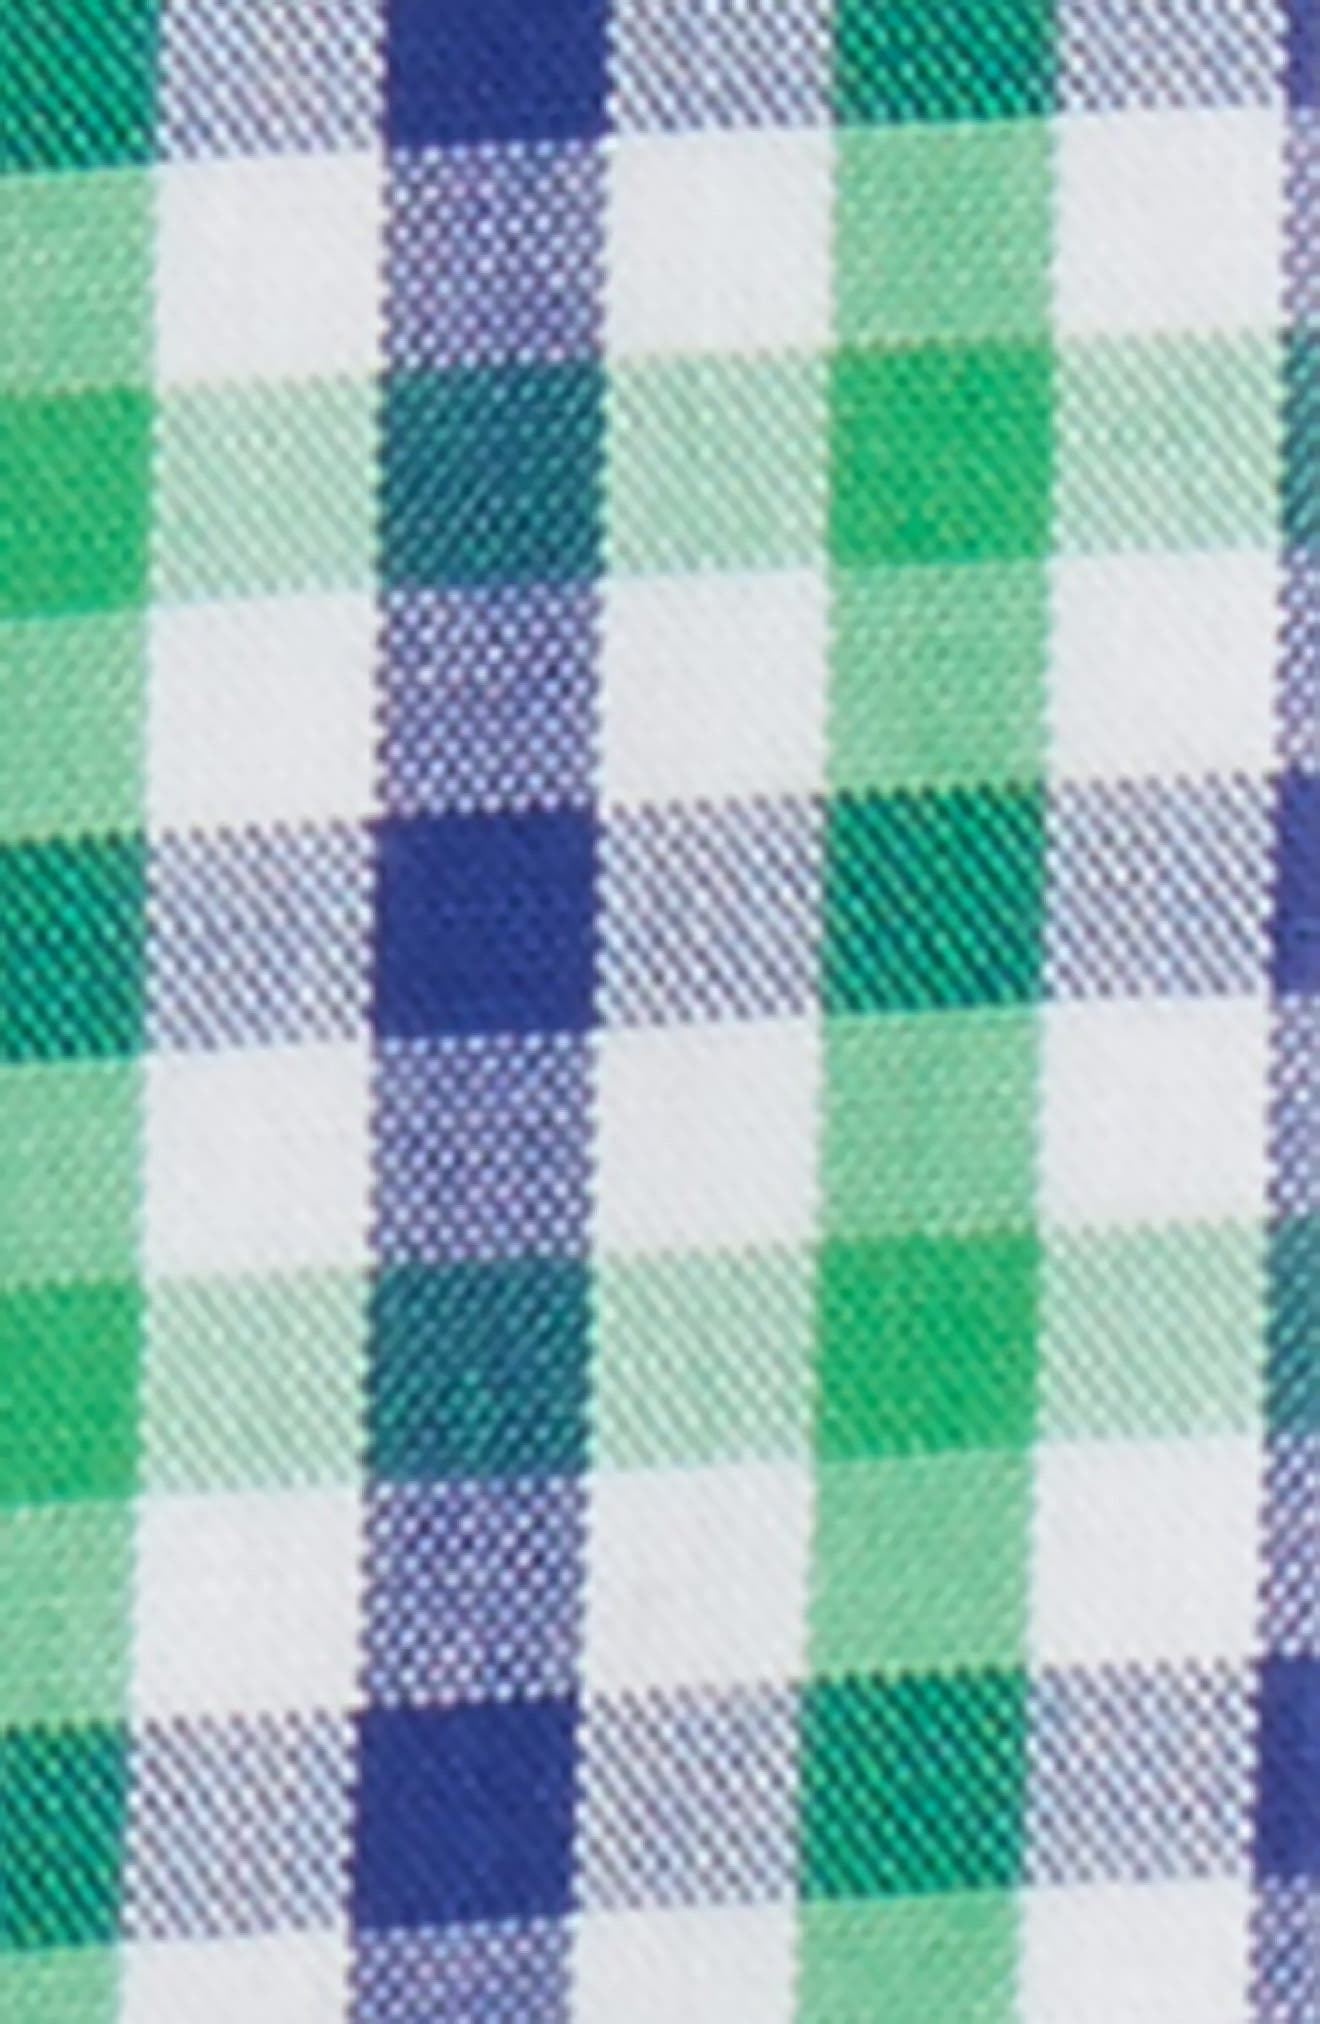 Ragazzo Check Suspenders,                             Alternate thumbnail 2, color,                             Green